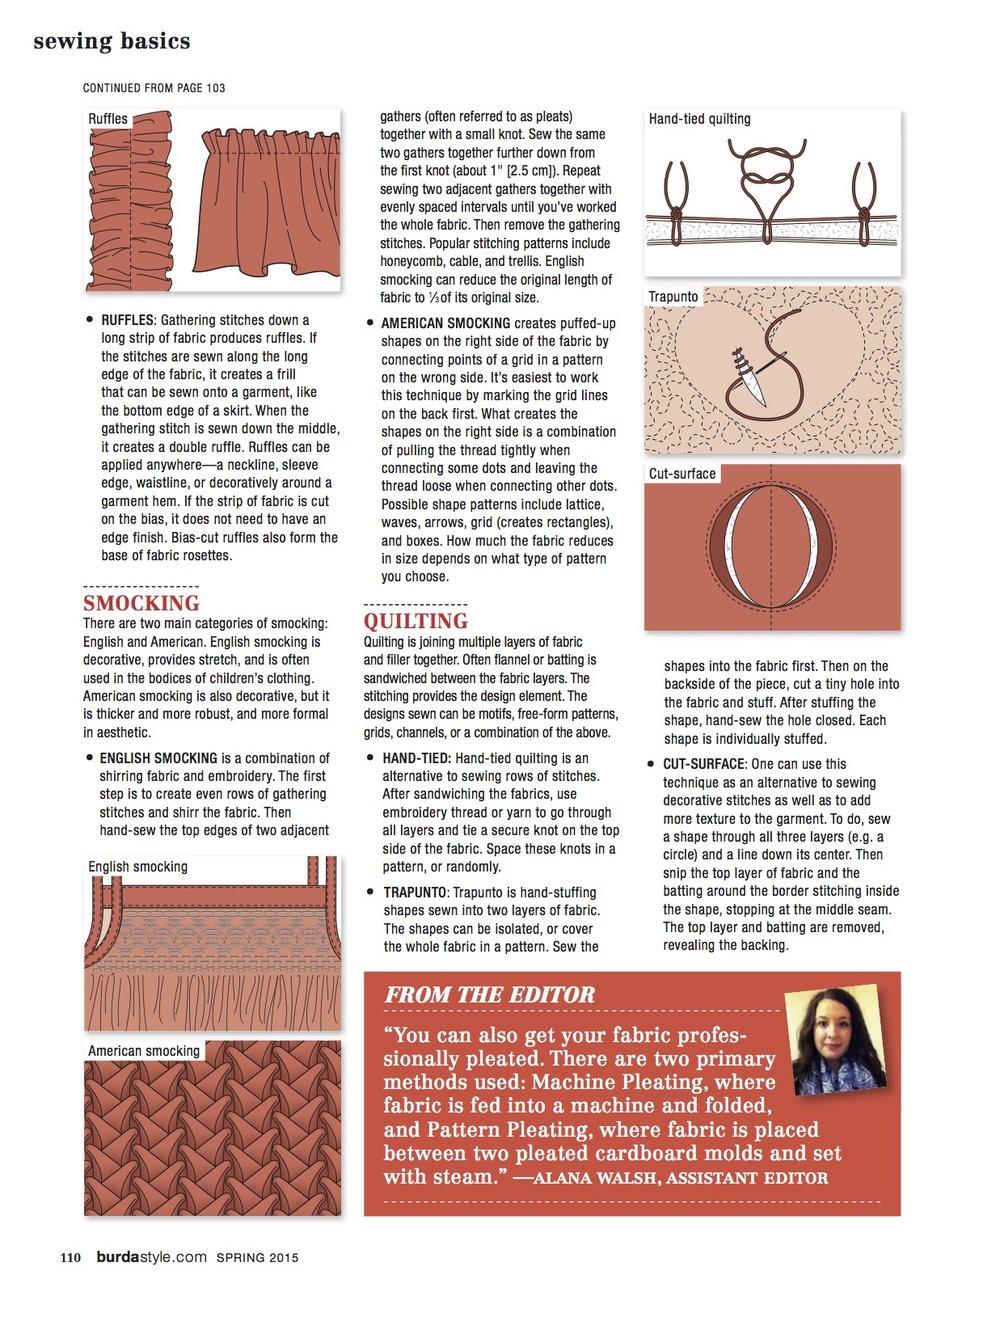 Sewing_Basics_Spring2015_Amanda_Kaufmann3.jpg